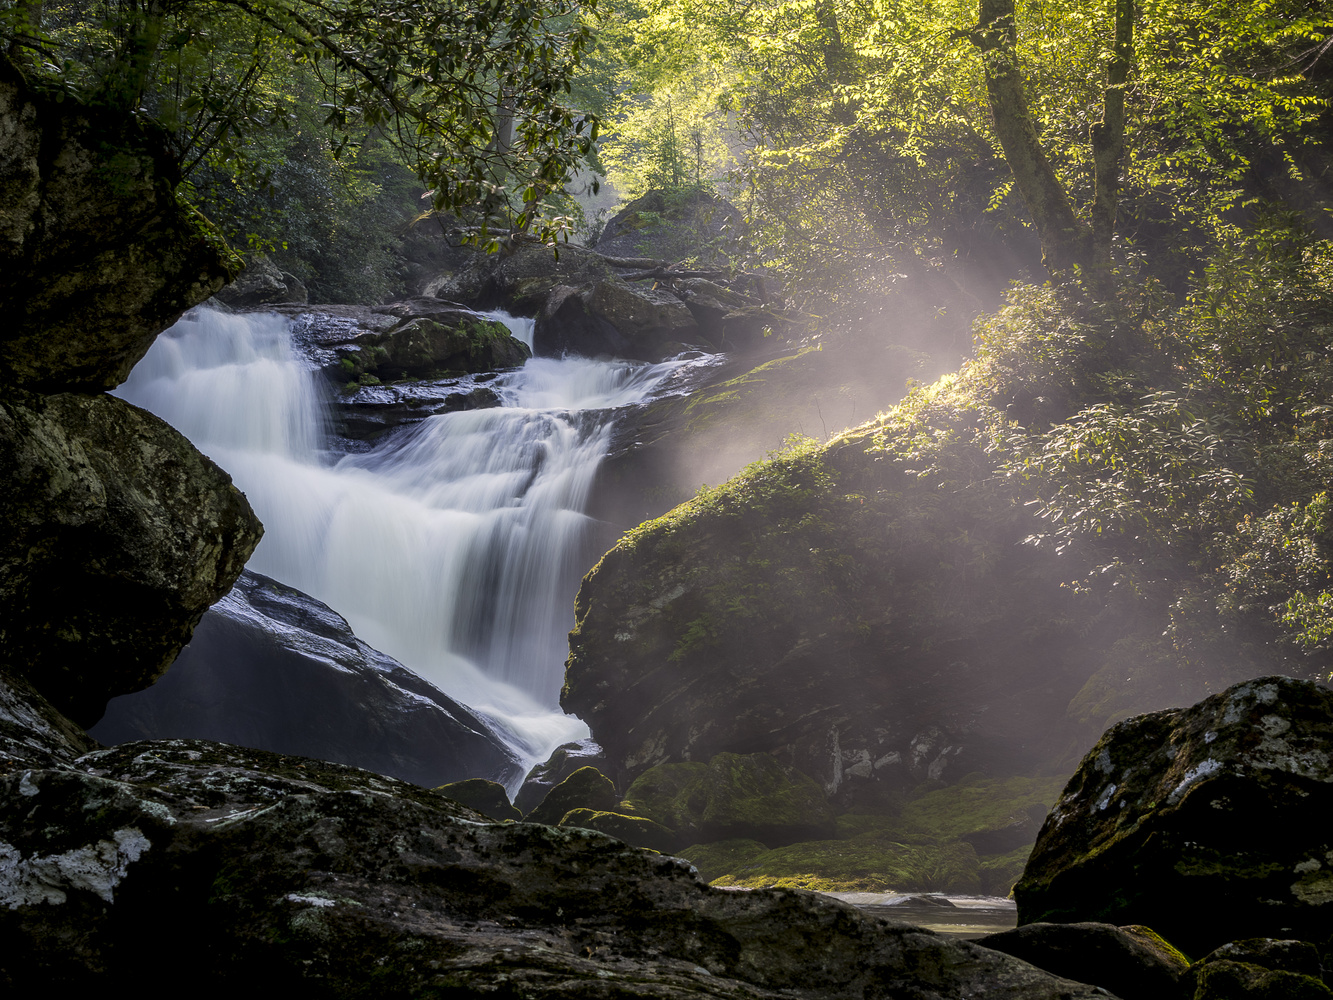 Secret of North Carolina by Andrew Lockwood